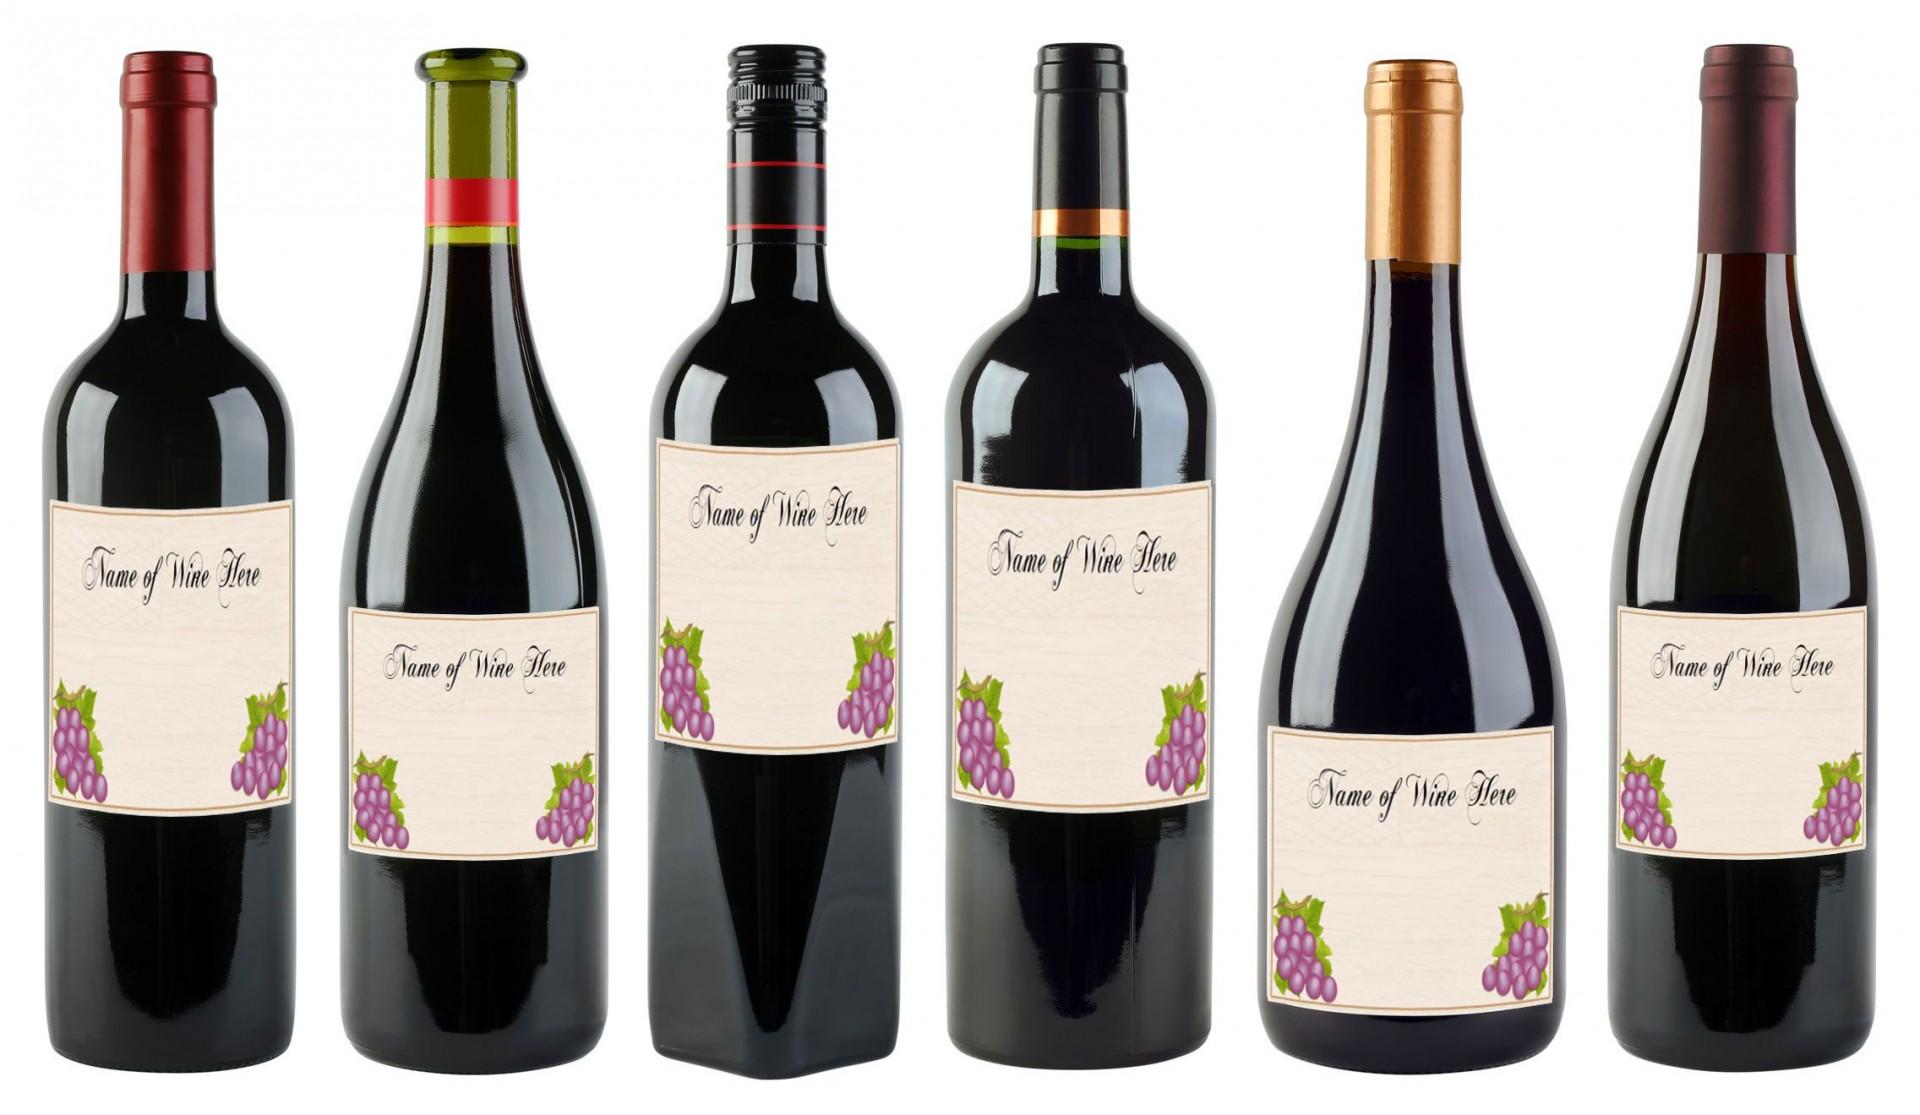 003 Impressive Free Wine Bottle Label Template Highest Quality  Mini Printable1920